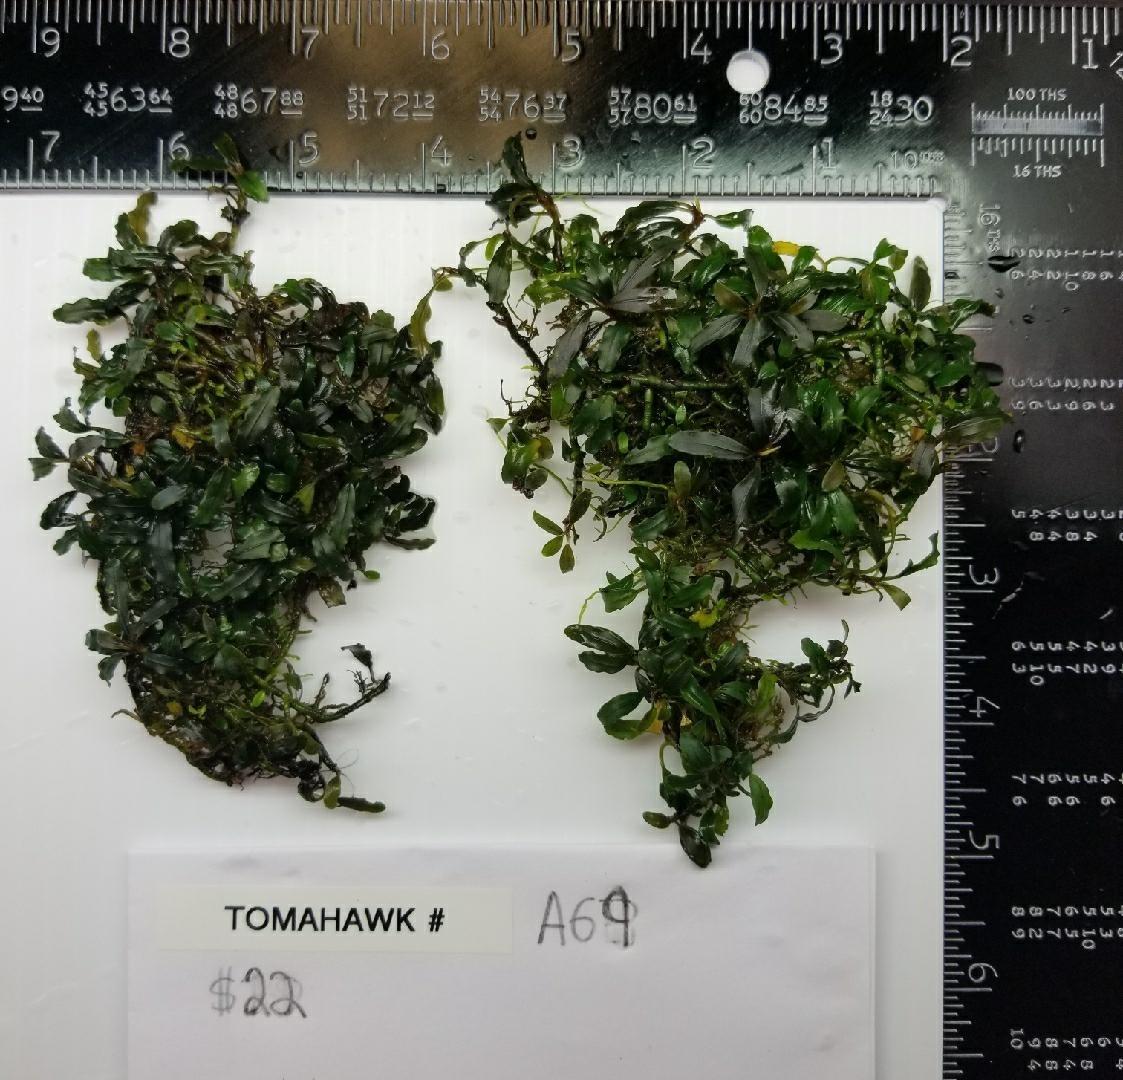 Tomahawk Buce - A69